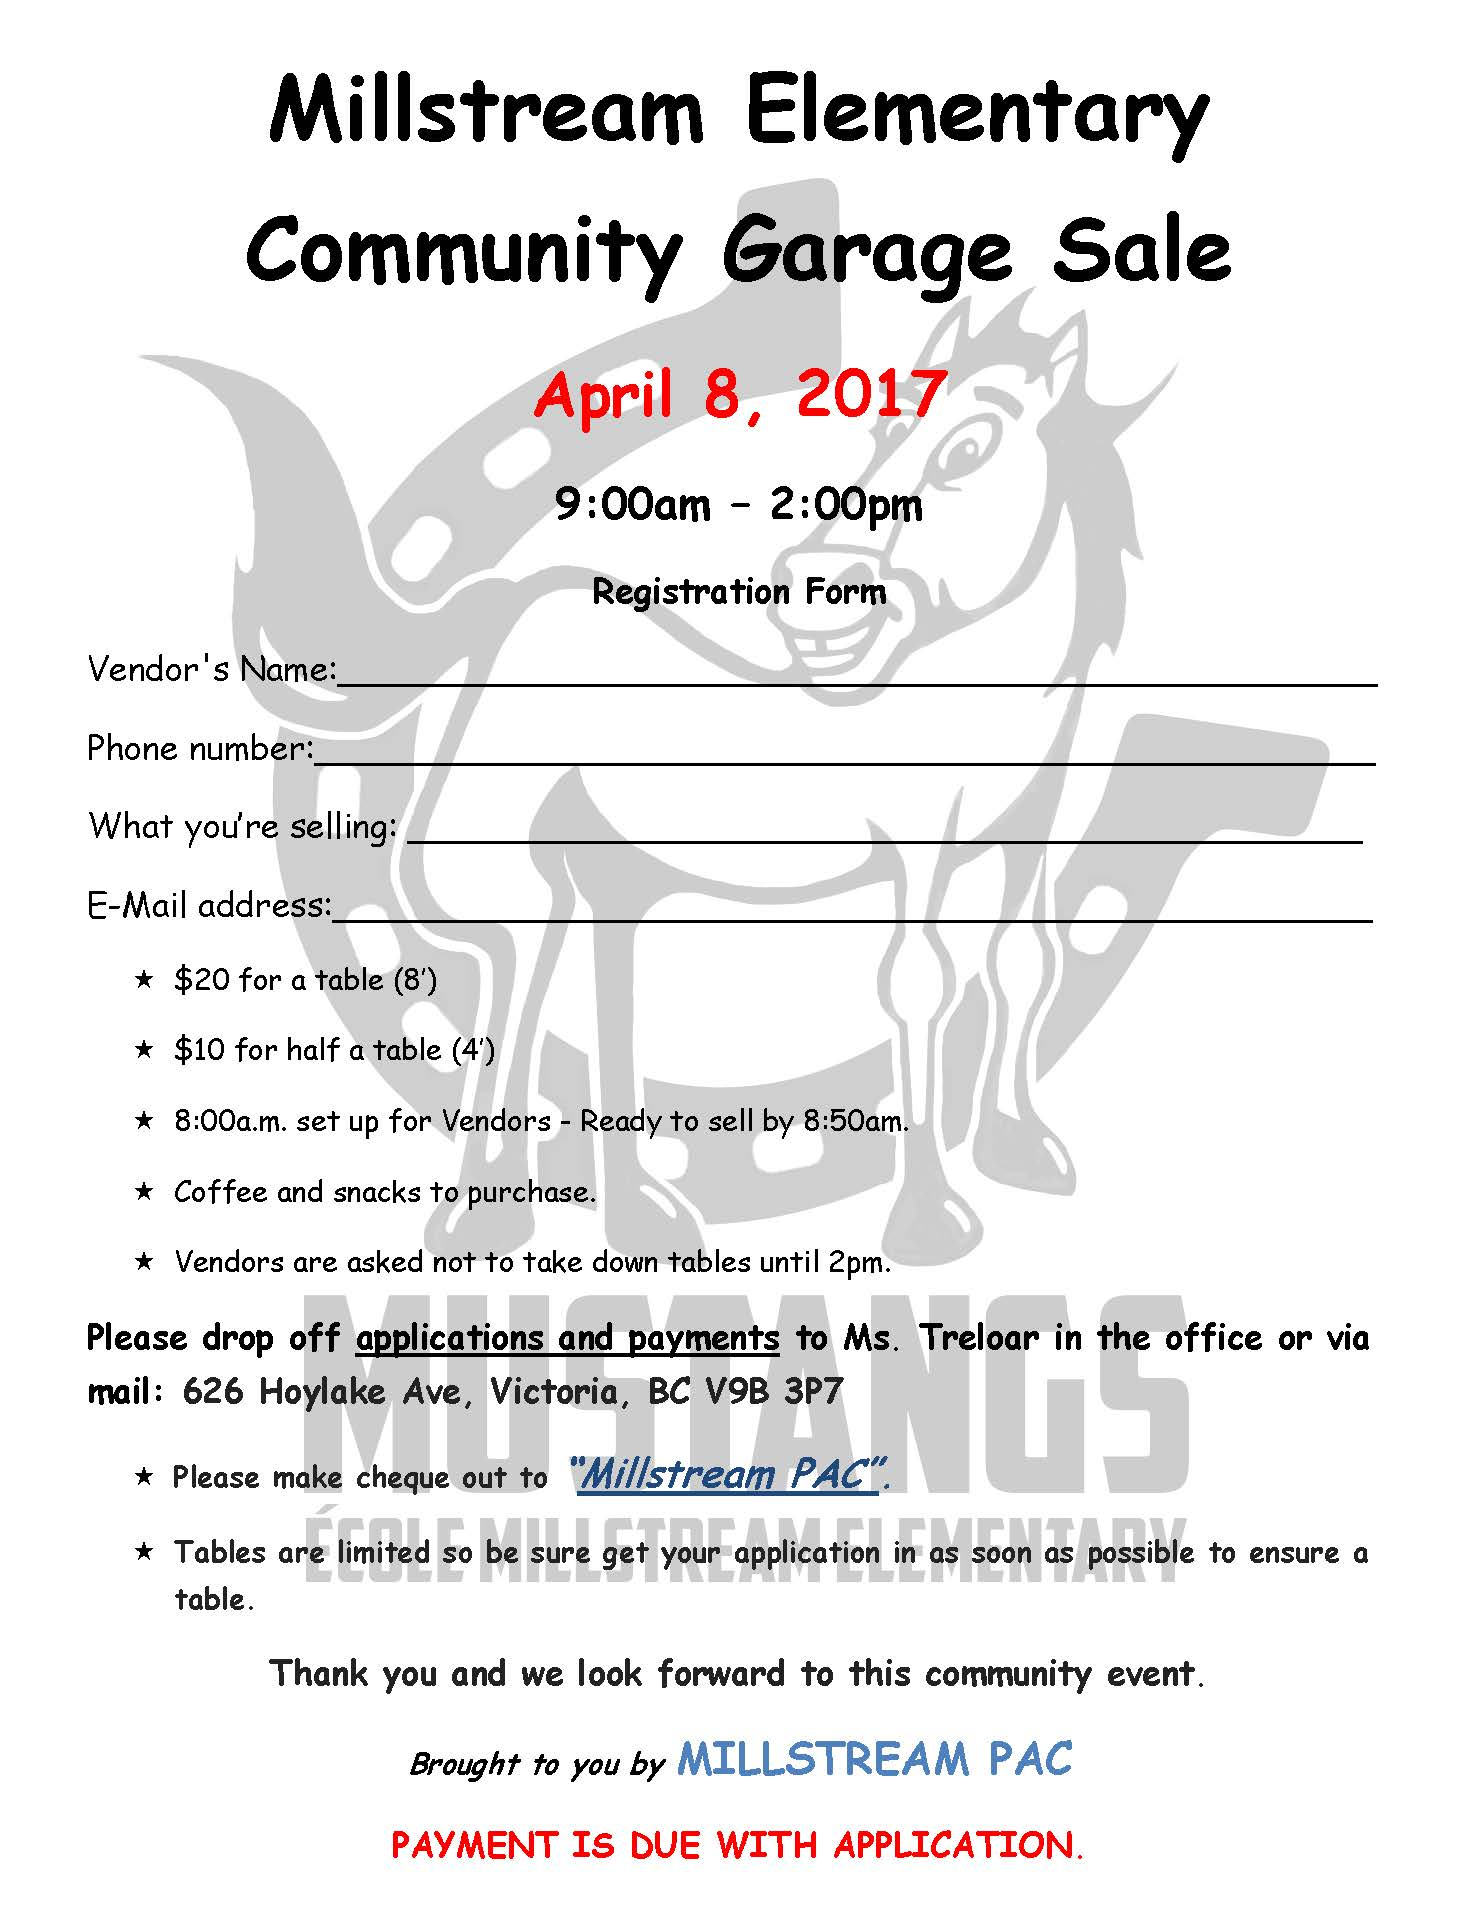 Millstream Elementary Community Garage Sale